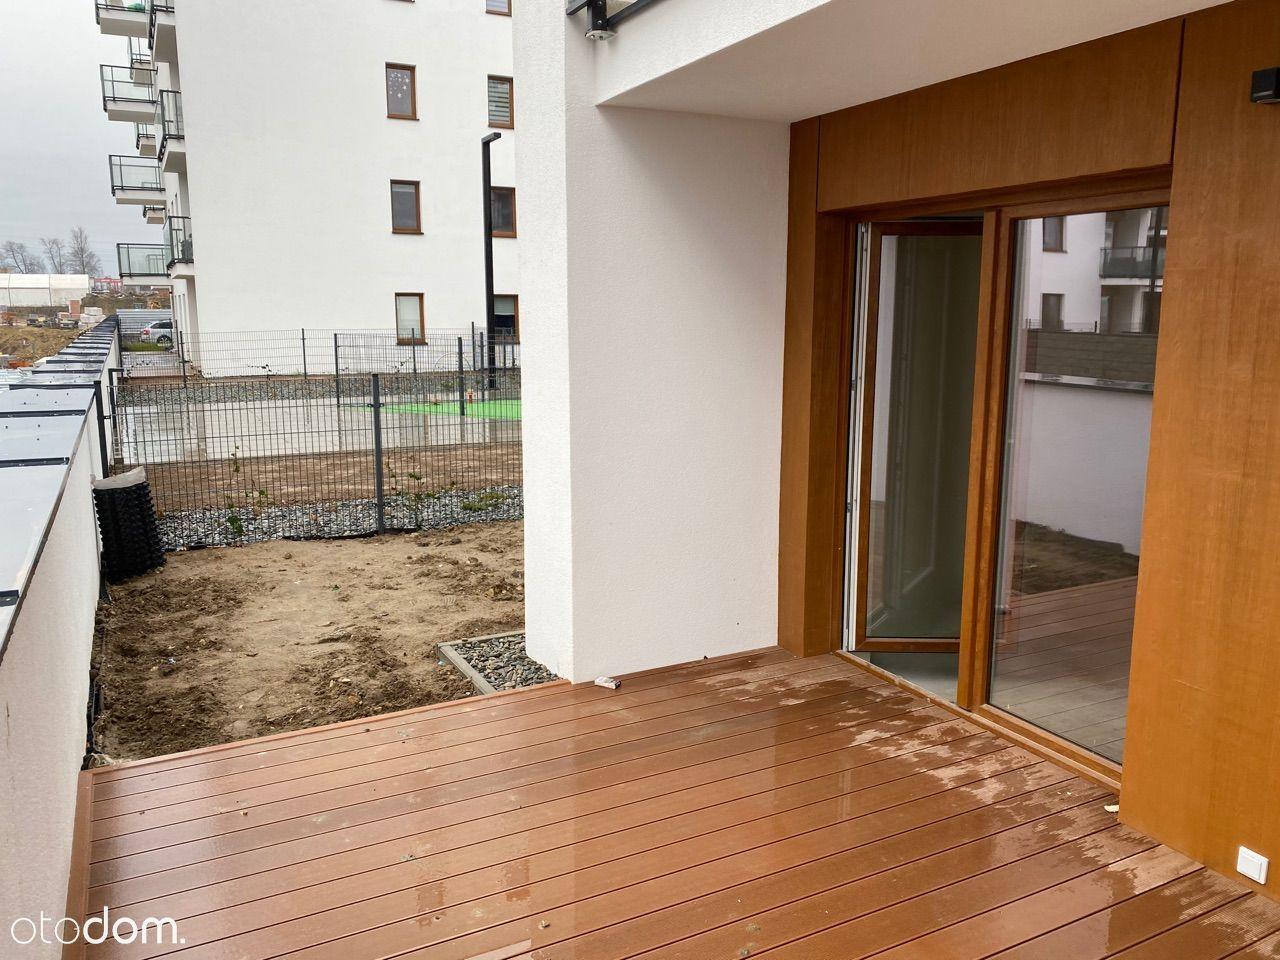 Mieszkanie 30,20m2 + taras 12,90m2 + ogródek 35m2